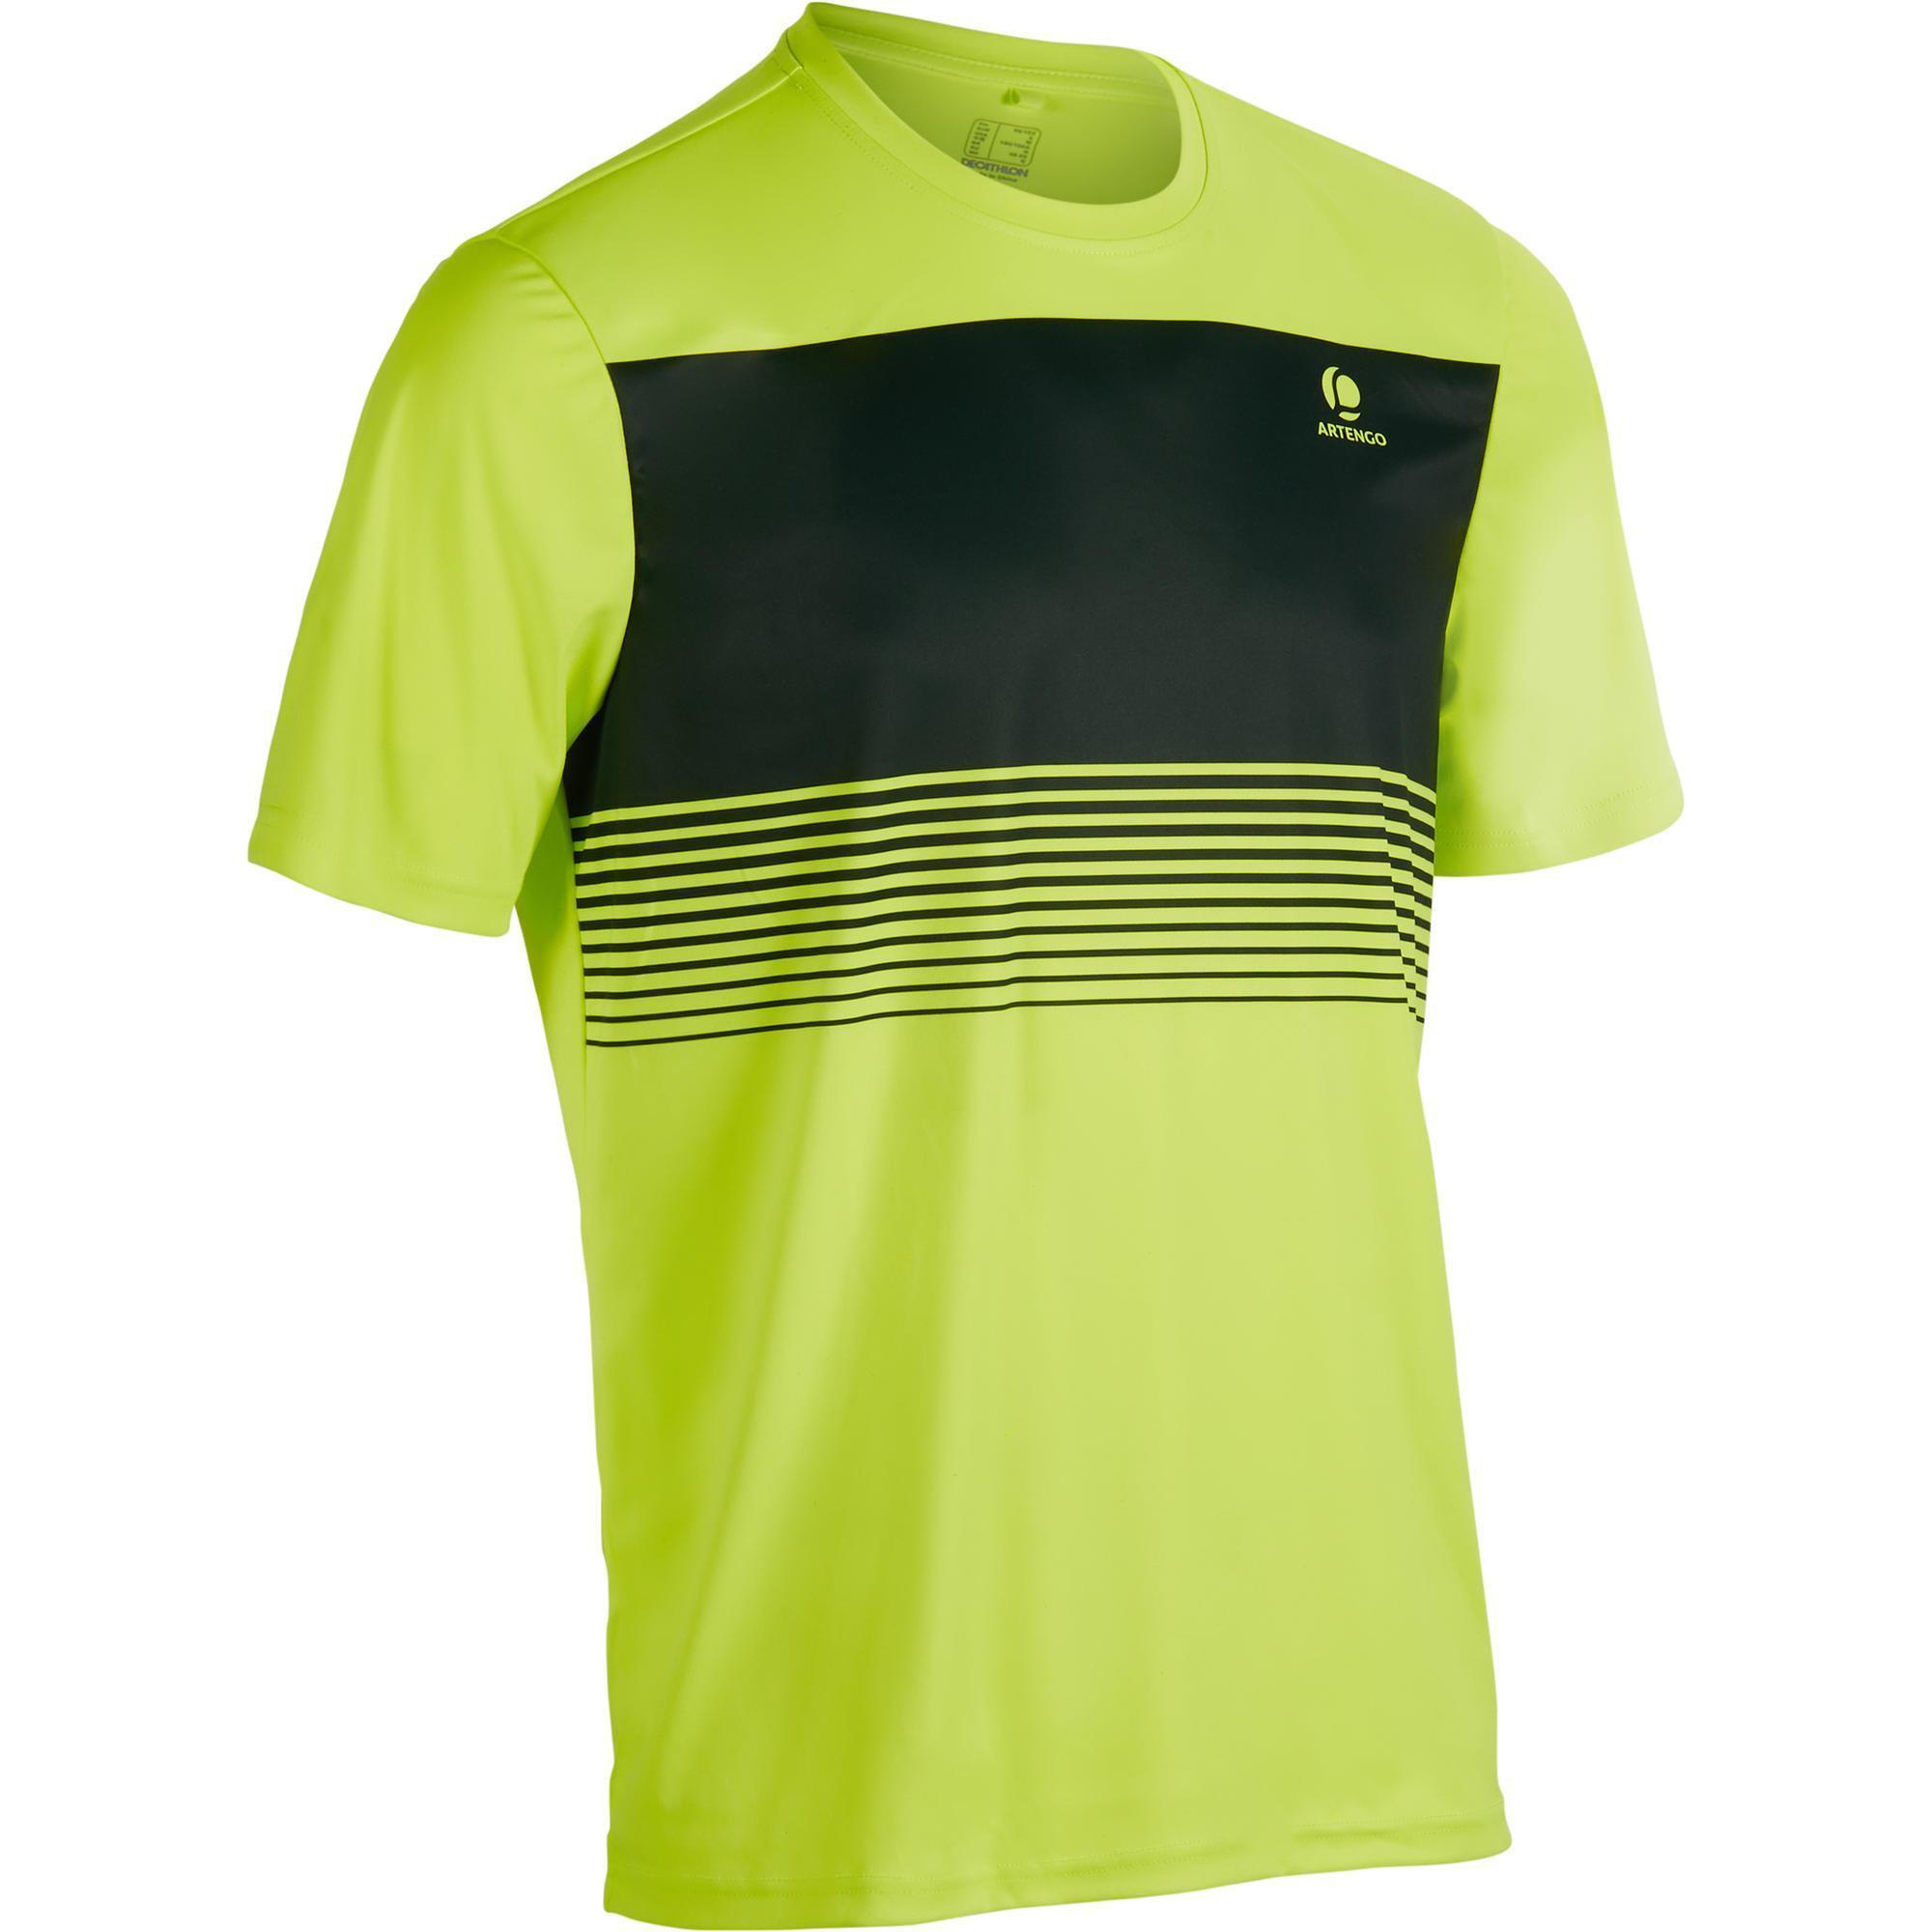 Soft 100 Tennis T-Shirt - Neon Yellow | artengo